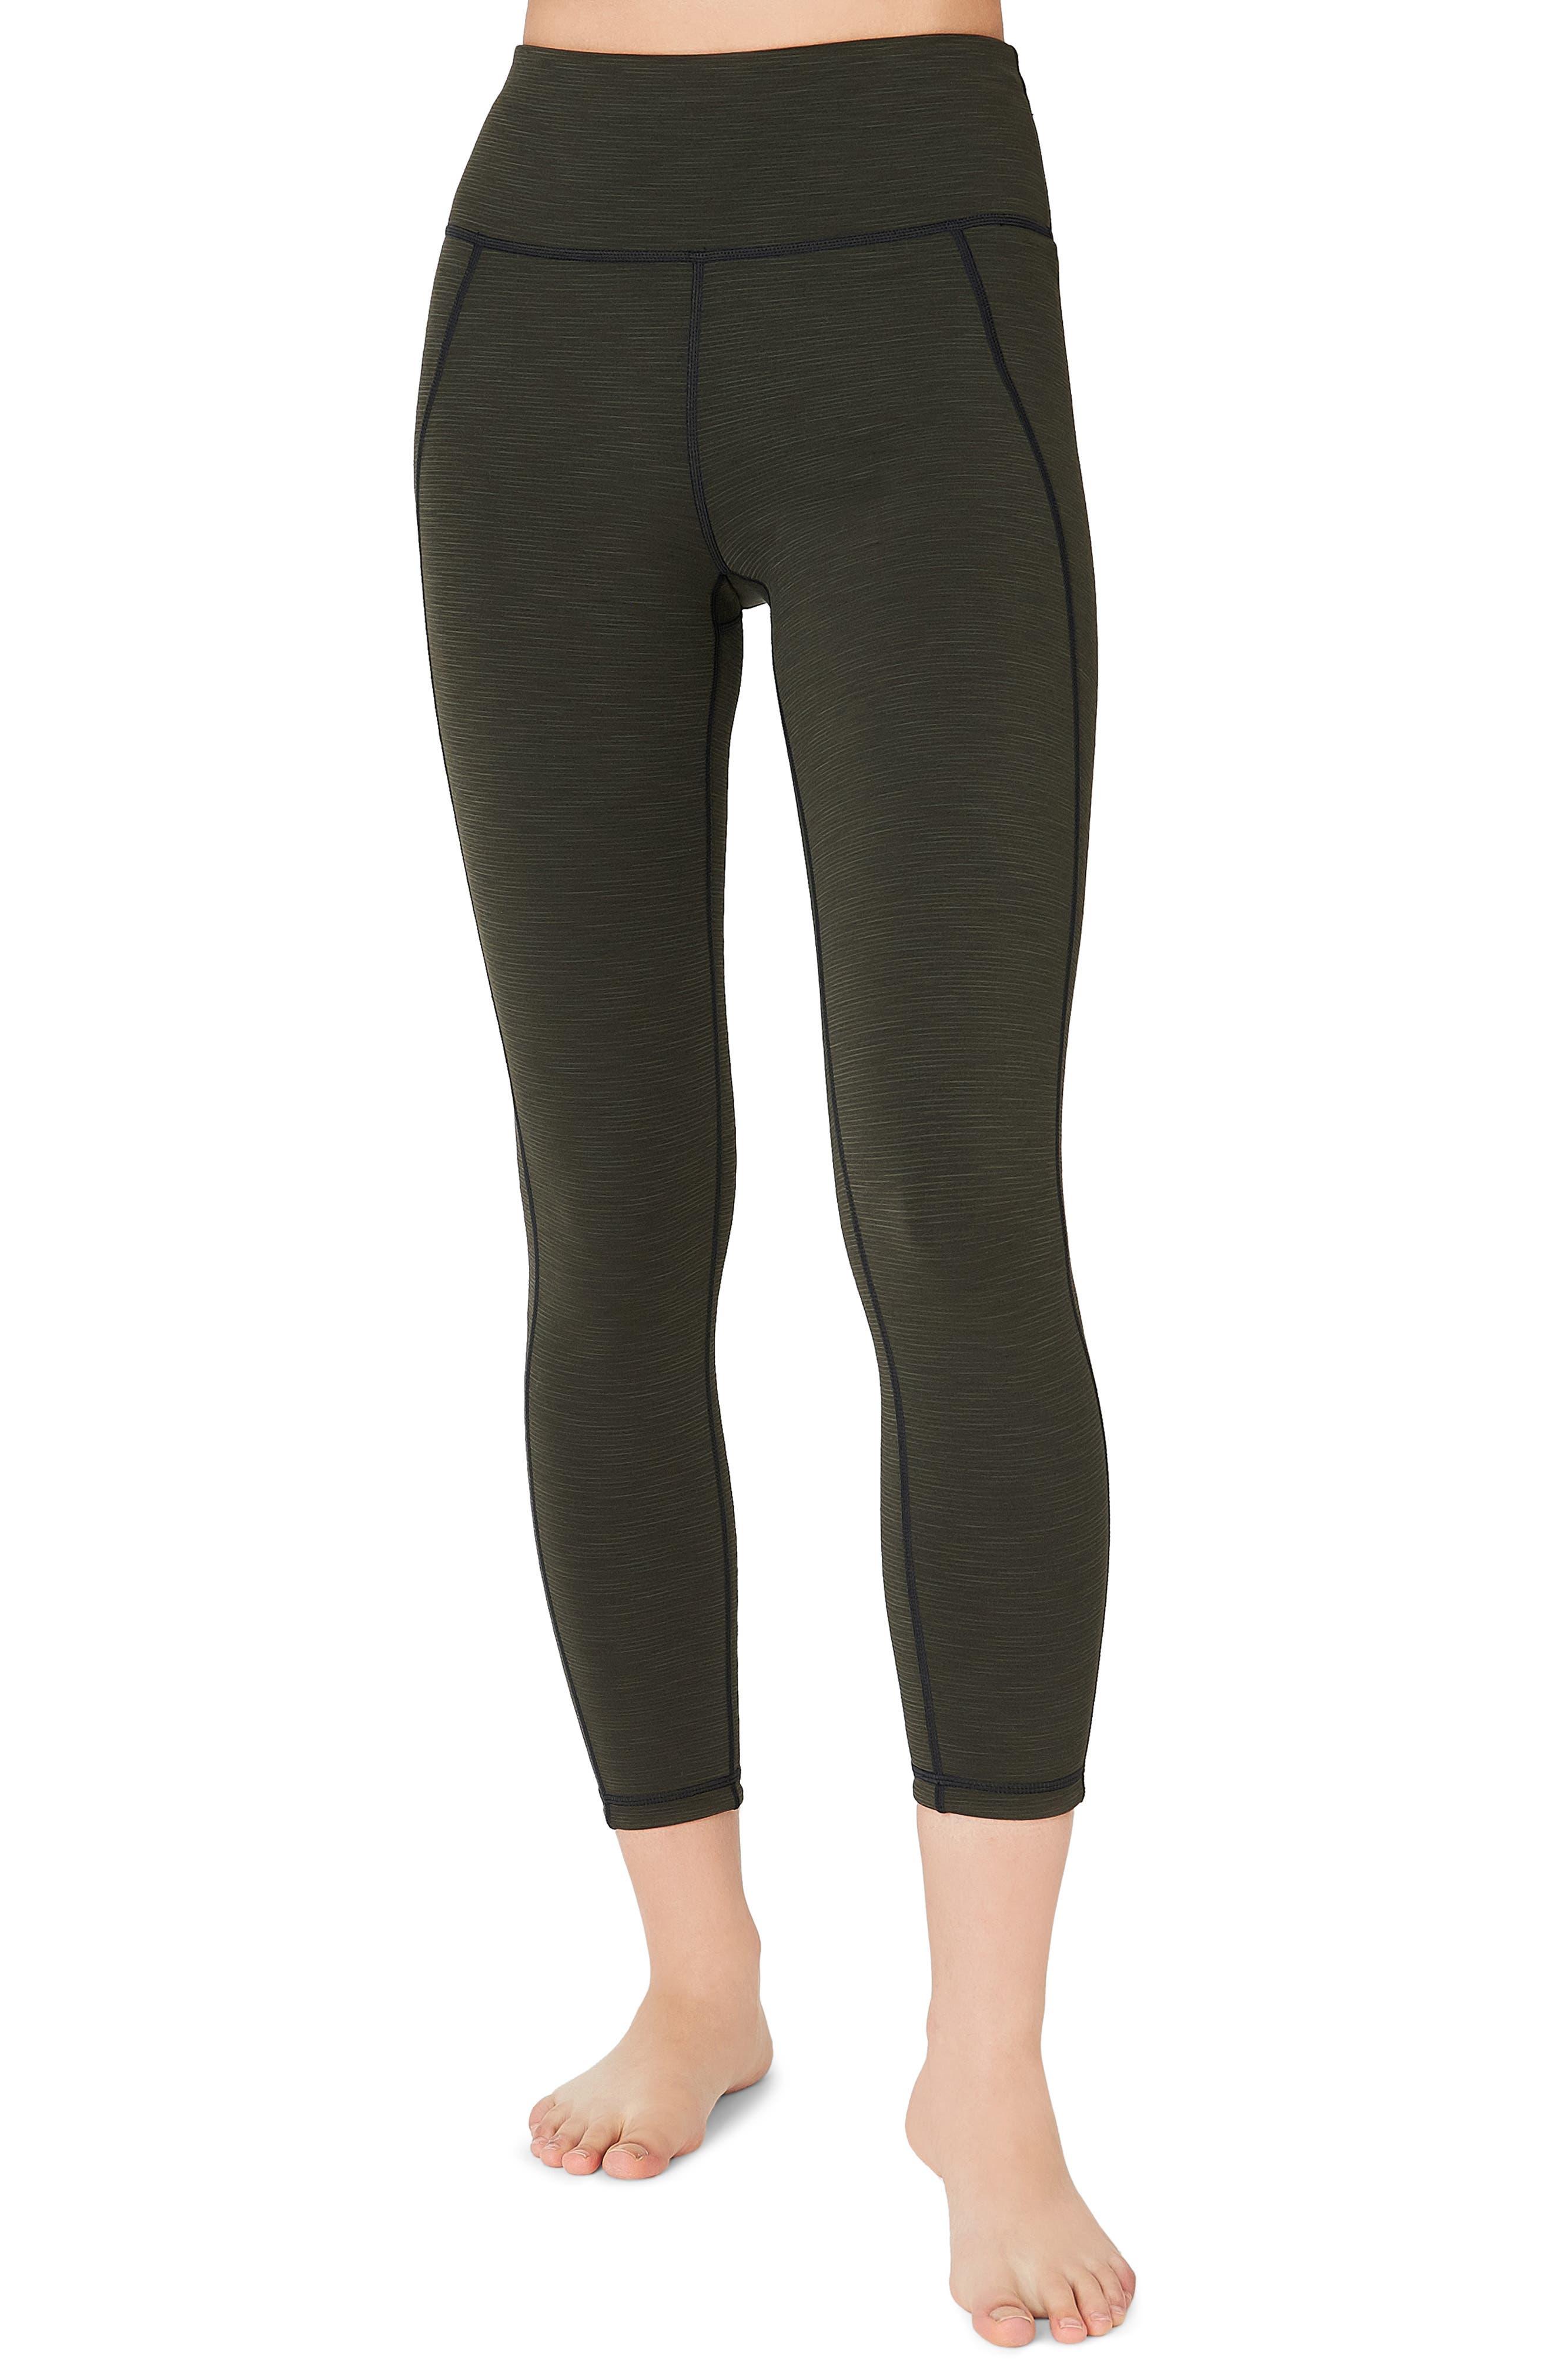 SWEATY BETTY, Reversible Yoga Leggings, Main thumbnail 1, color, 300